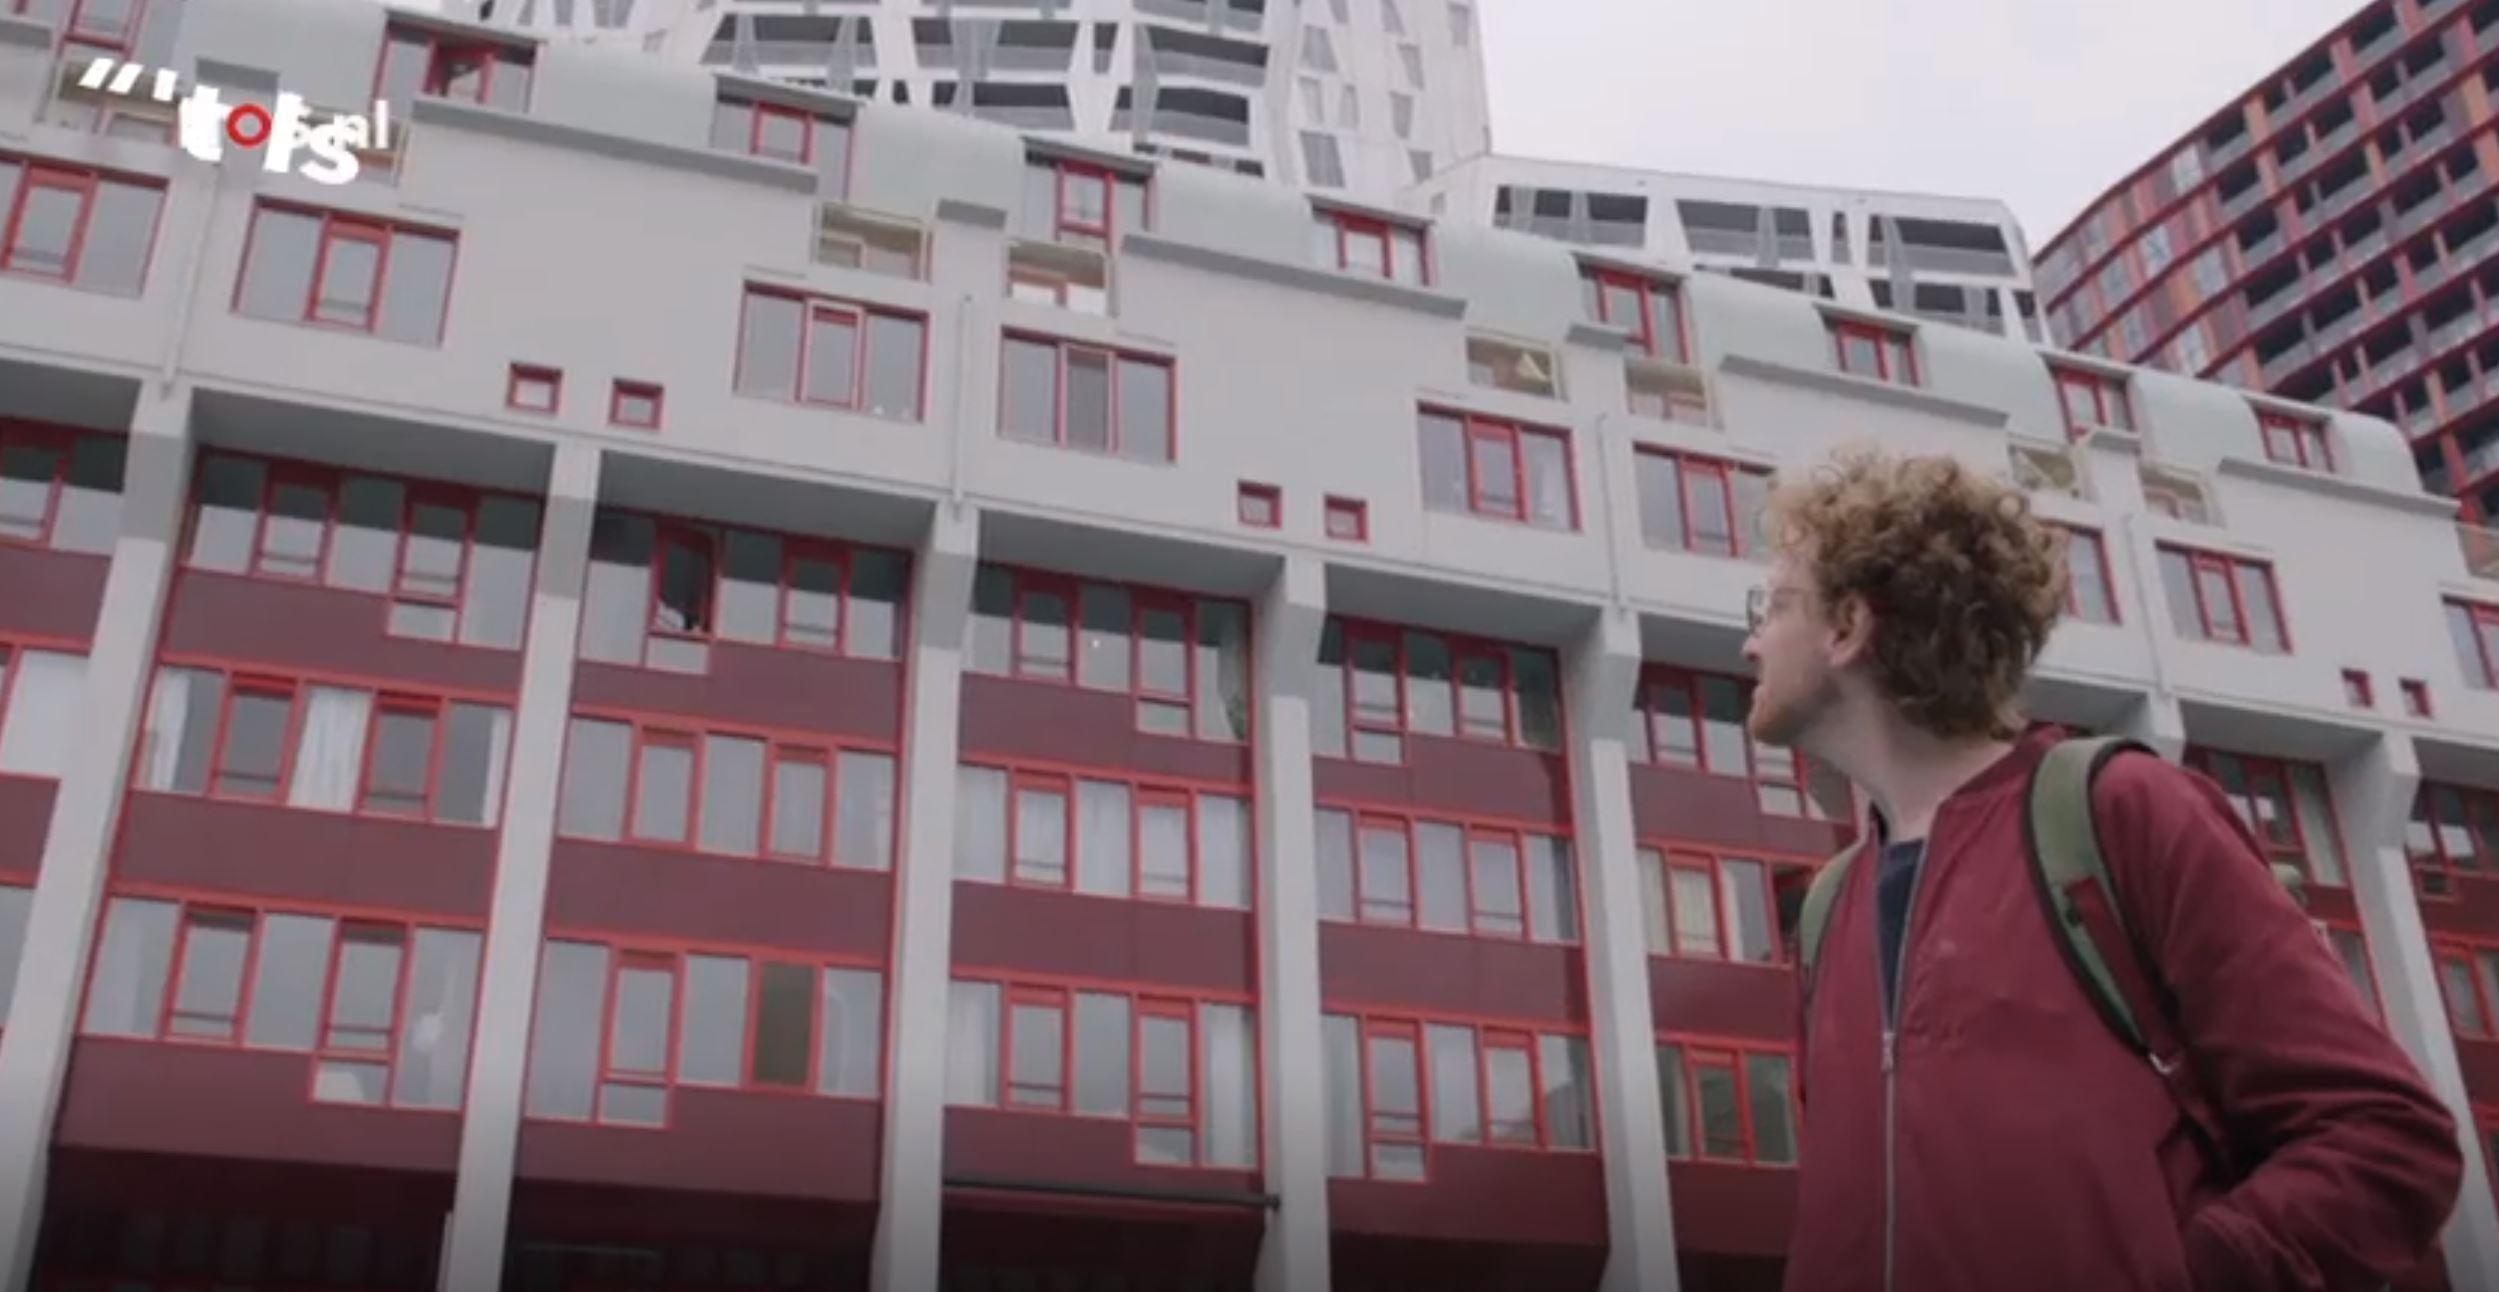 Lofzang op lelijke Rotterdamse gebouwen